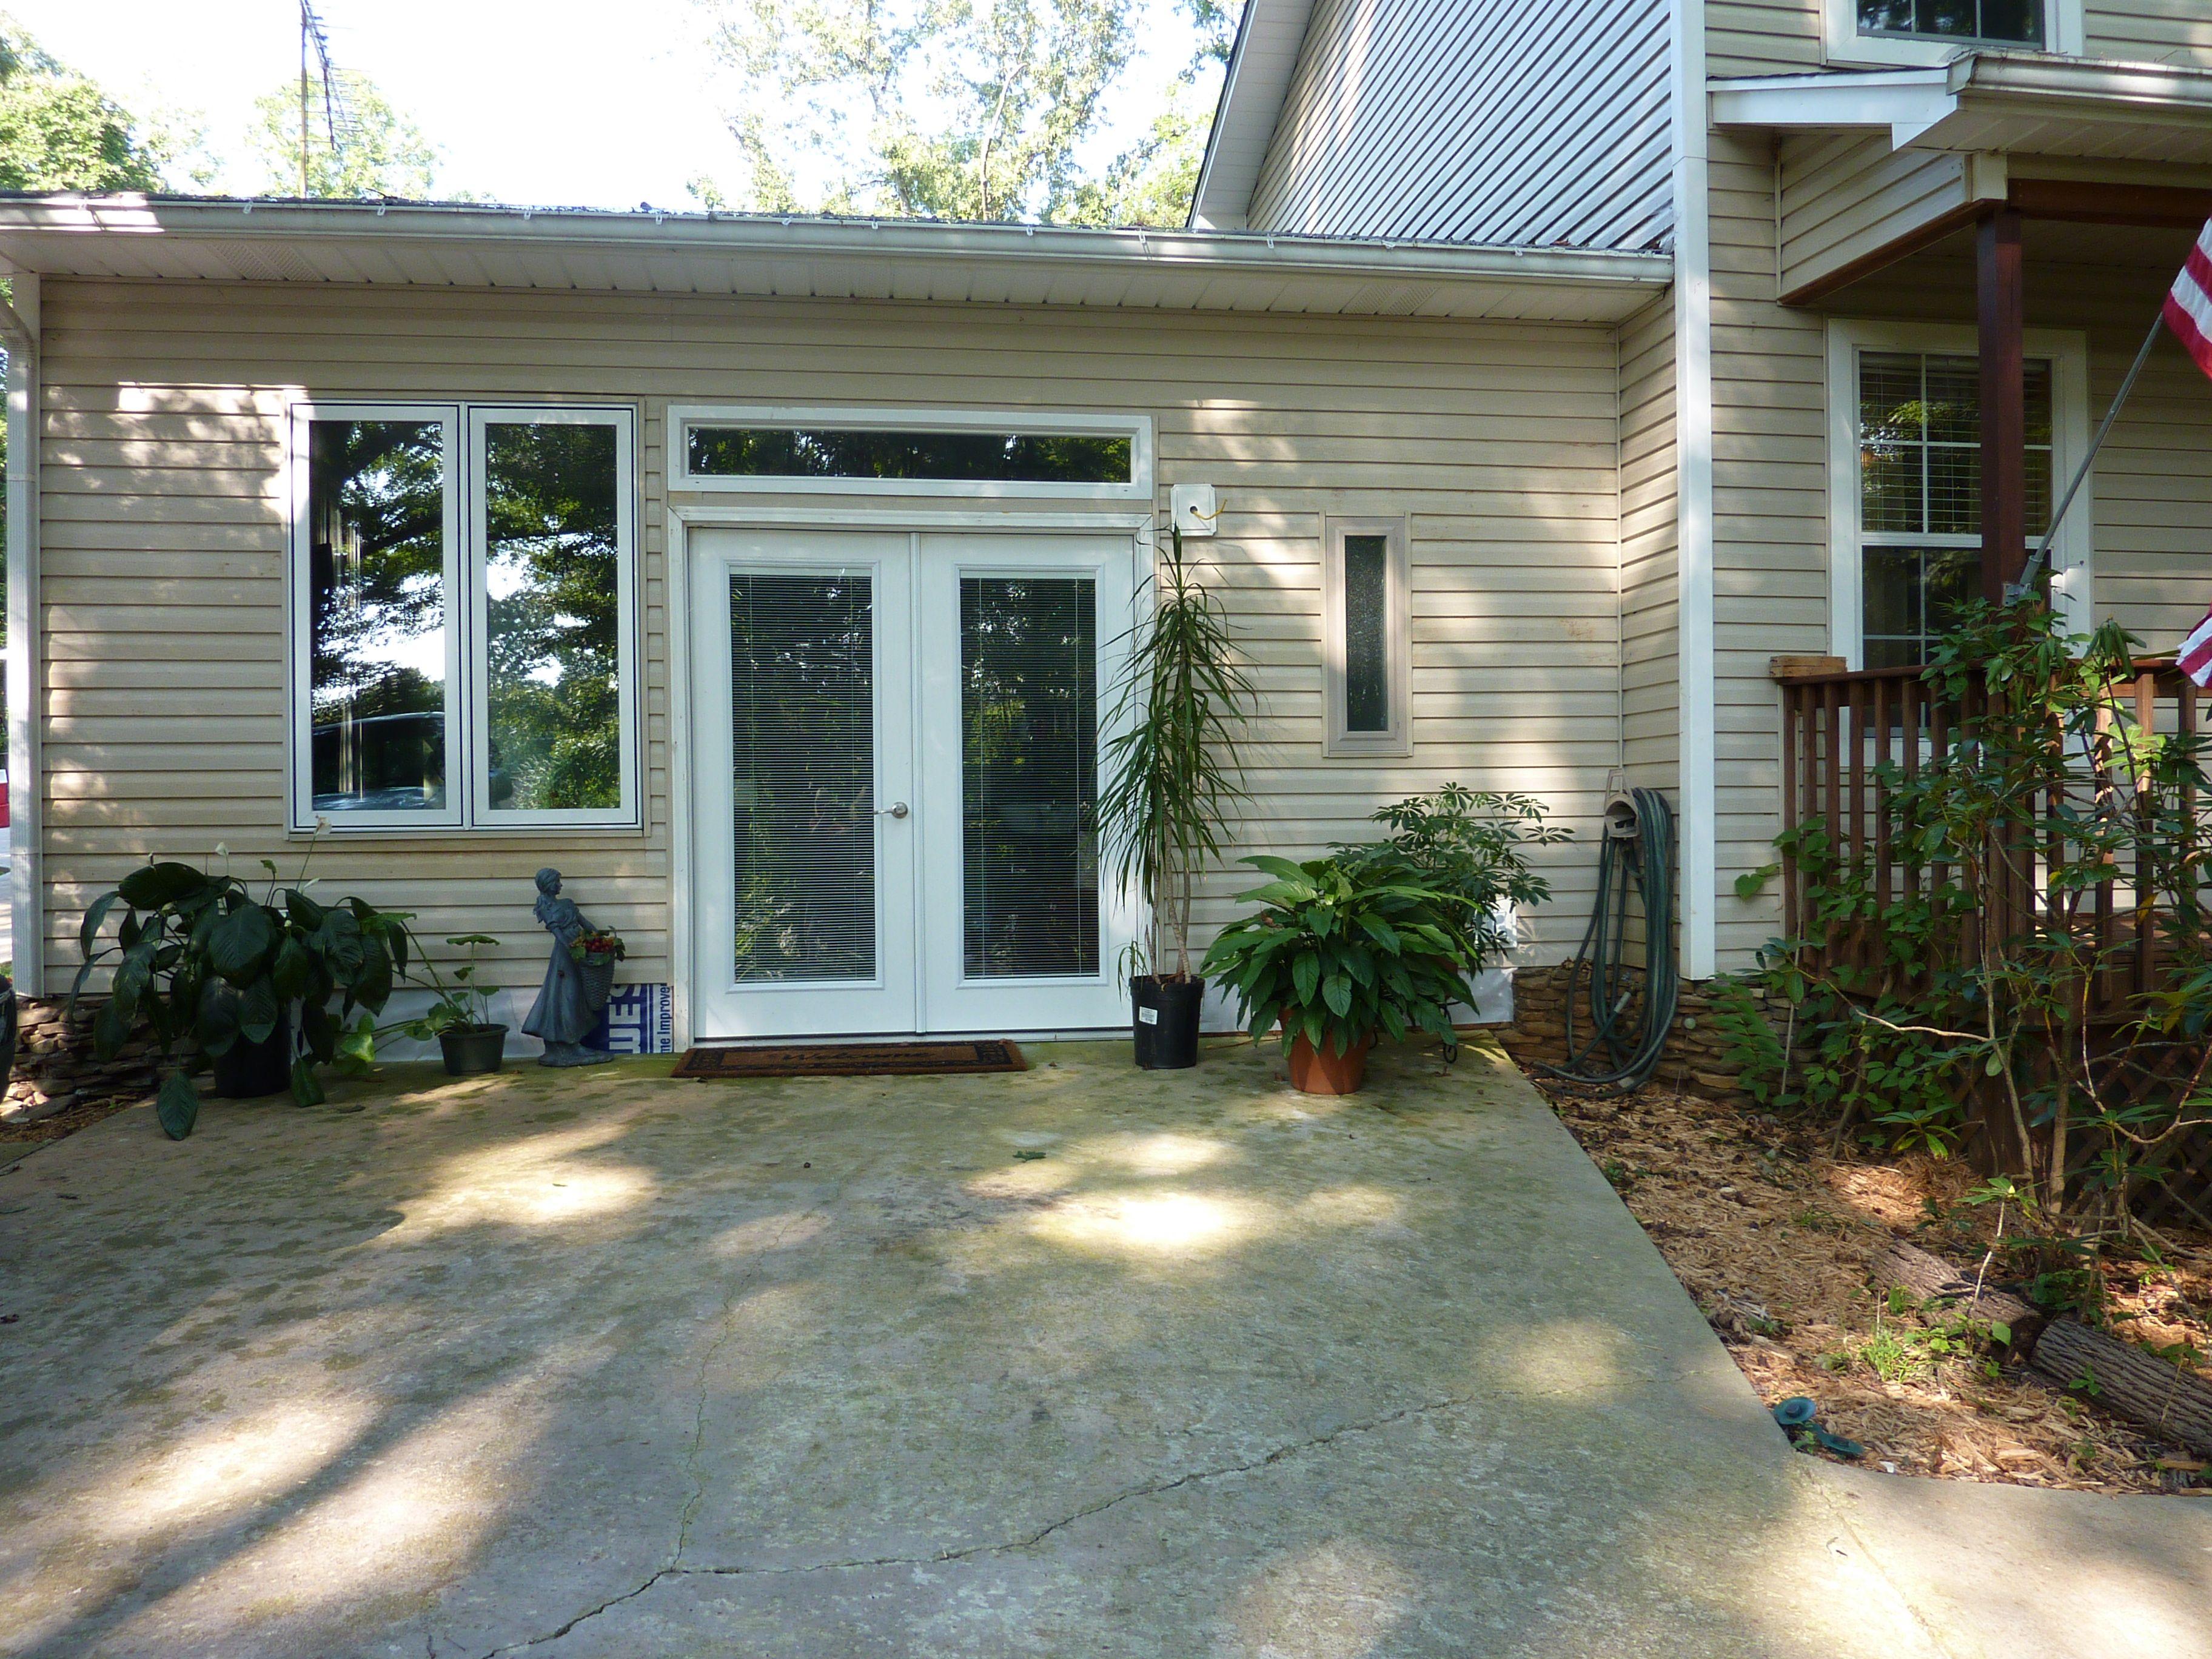 Attached garage after salon conversion. | DIY | Pinterest ...